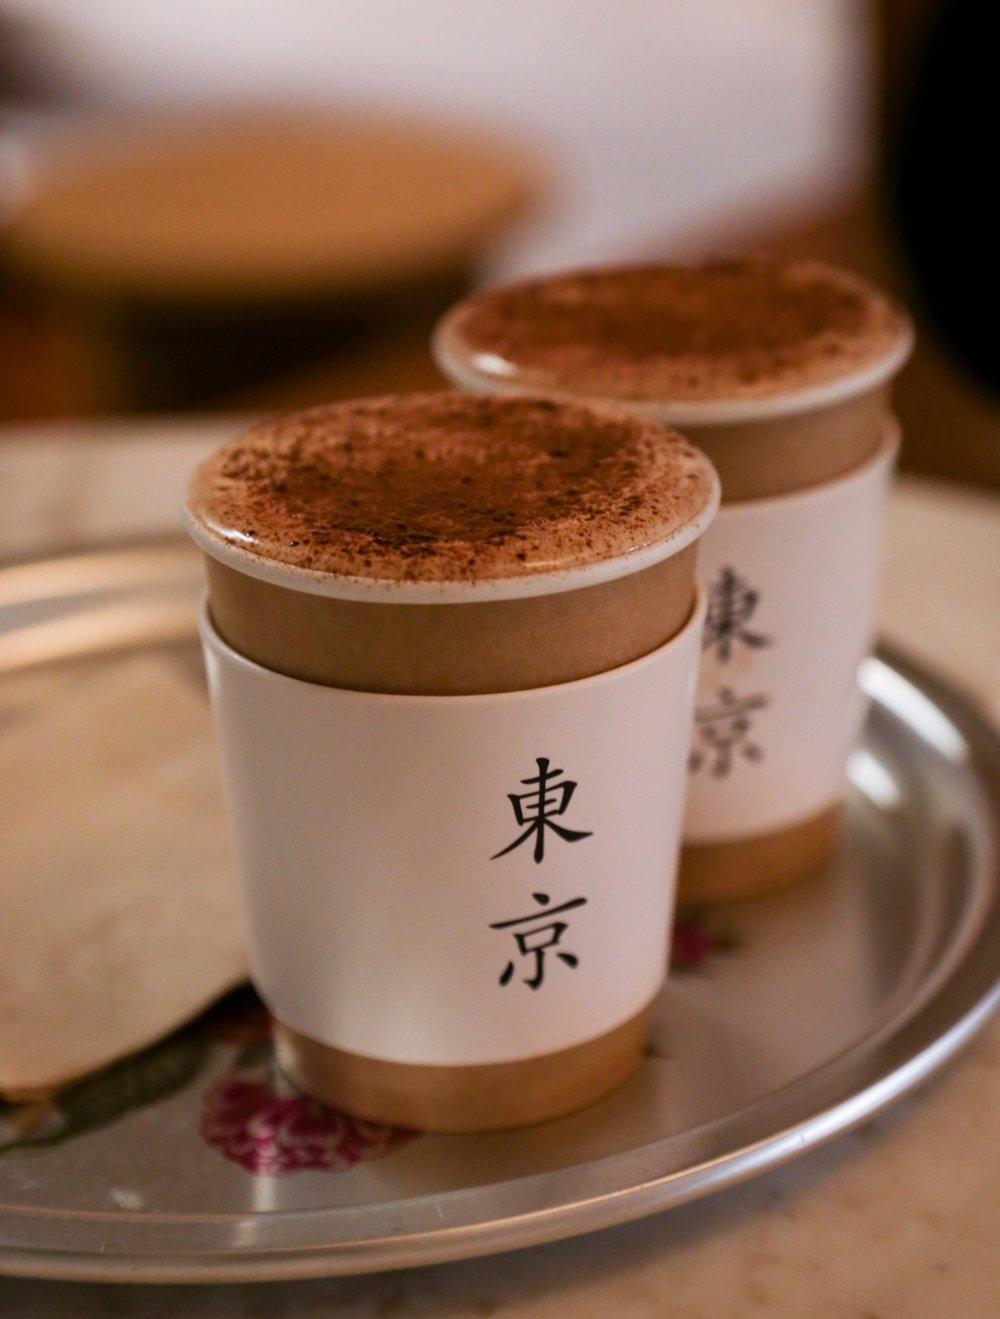 Dong-Gyeong Coffee's Hot Chocolate